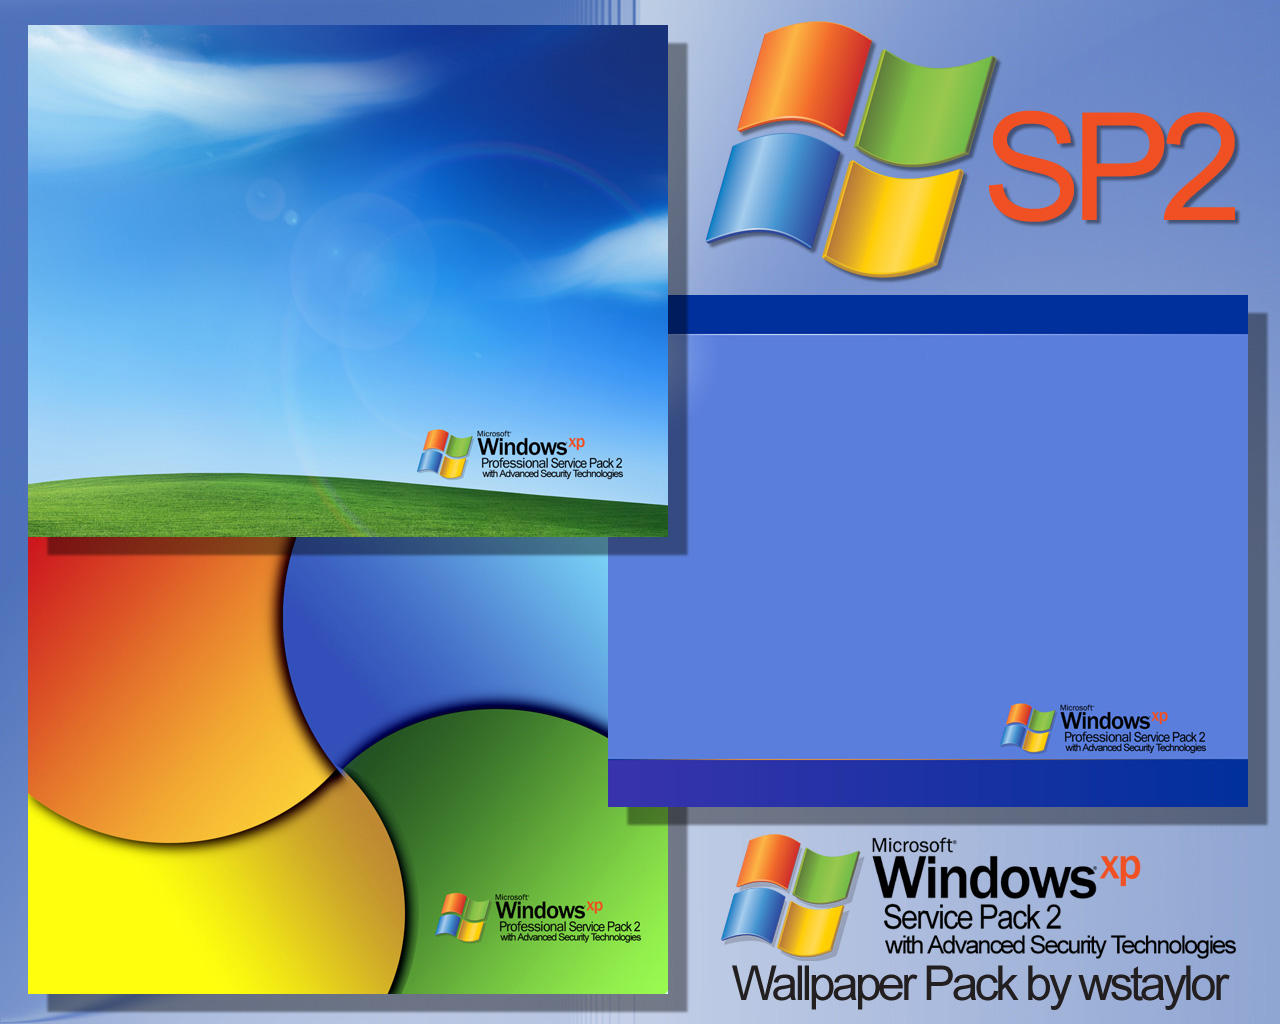 xp sp2 download file: